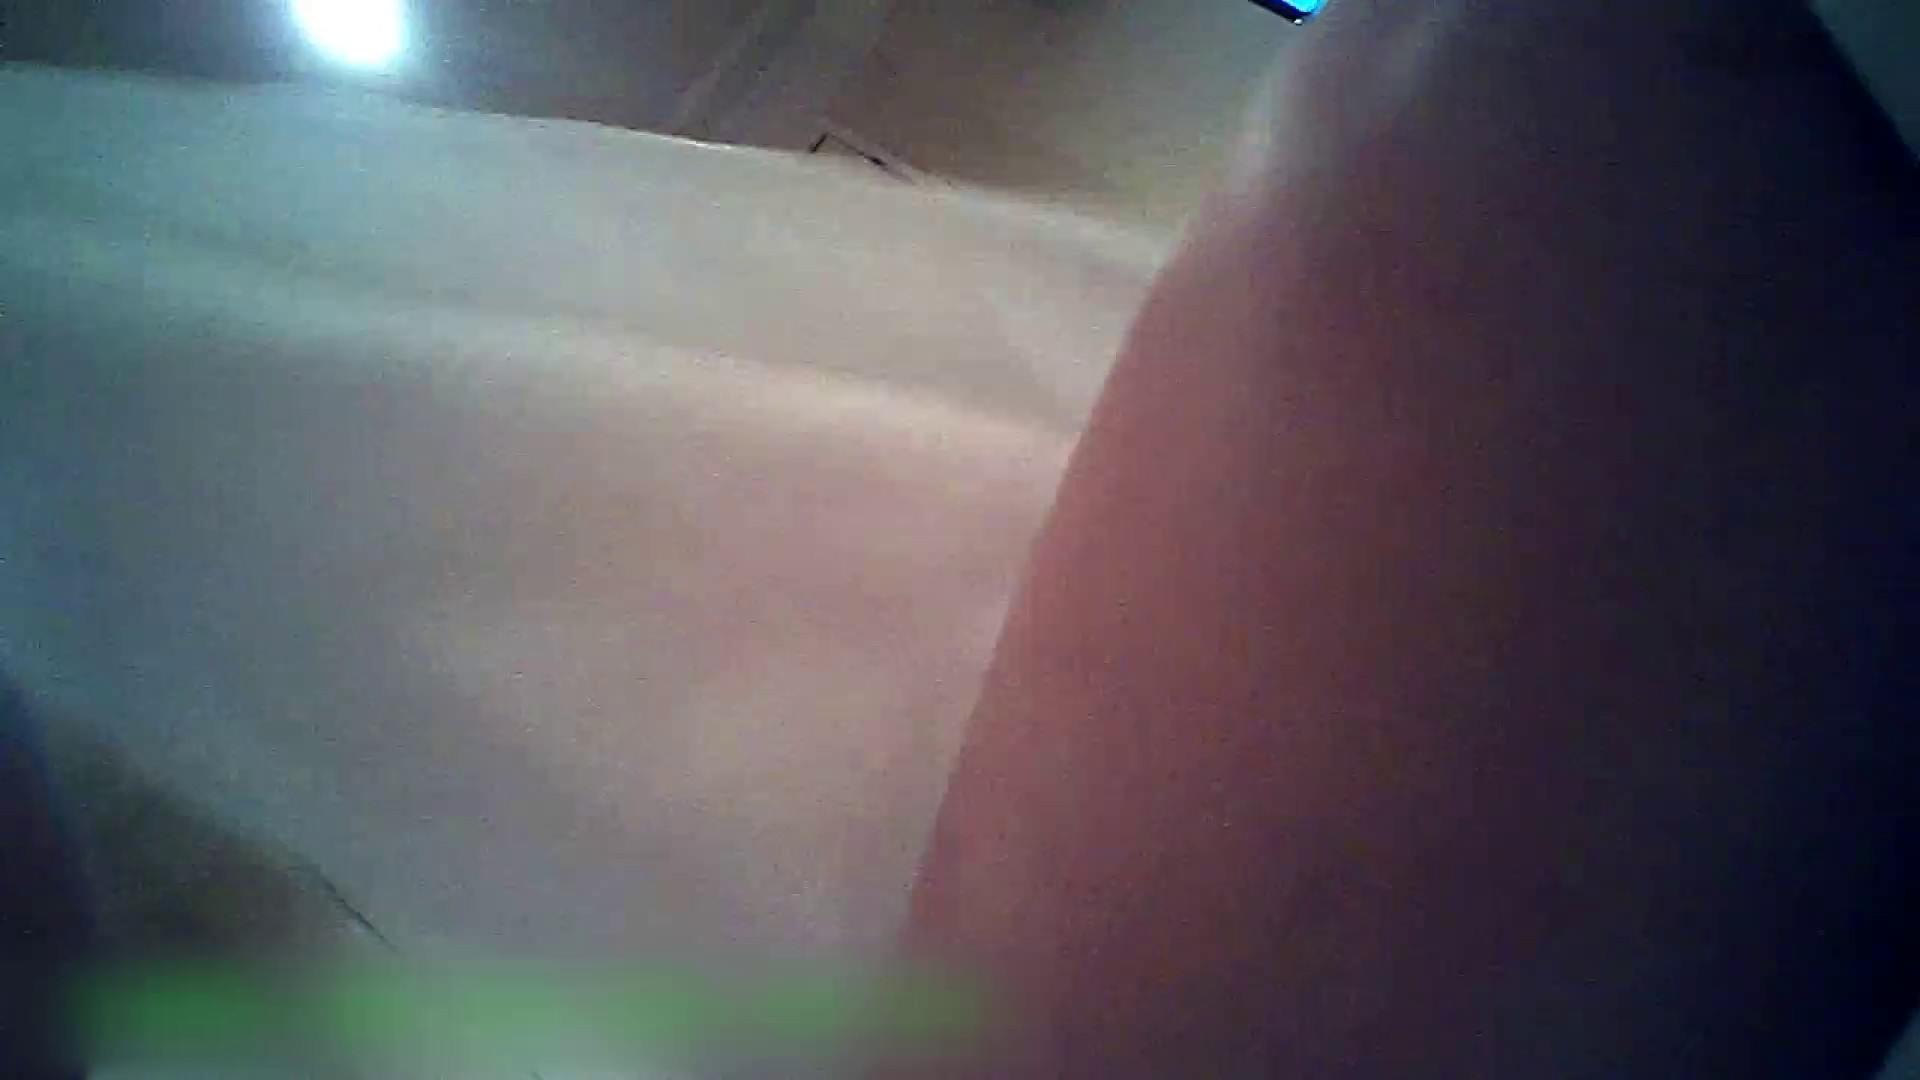 ▲2017_13位▲ 学園アイドル美人女子大生❷(下巻)5人詰合せVol.50 女子大生  107連発 4